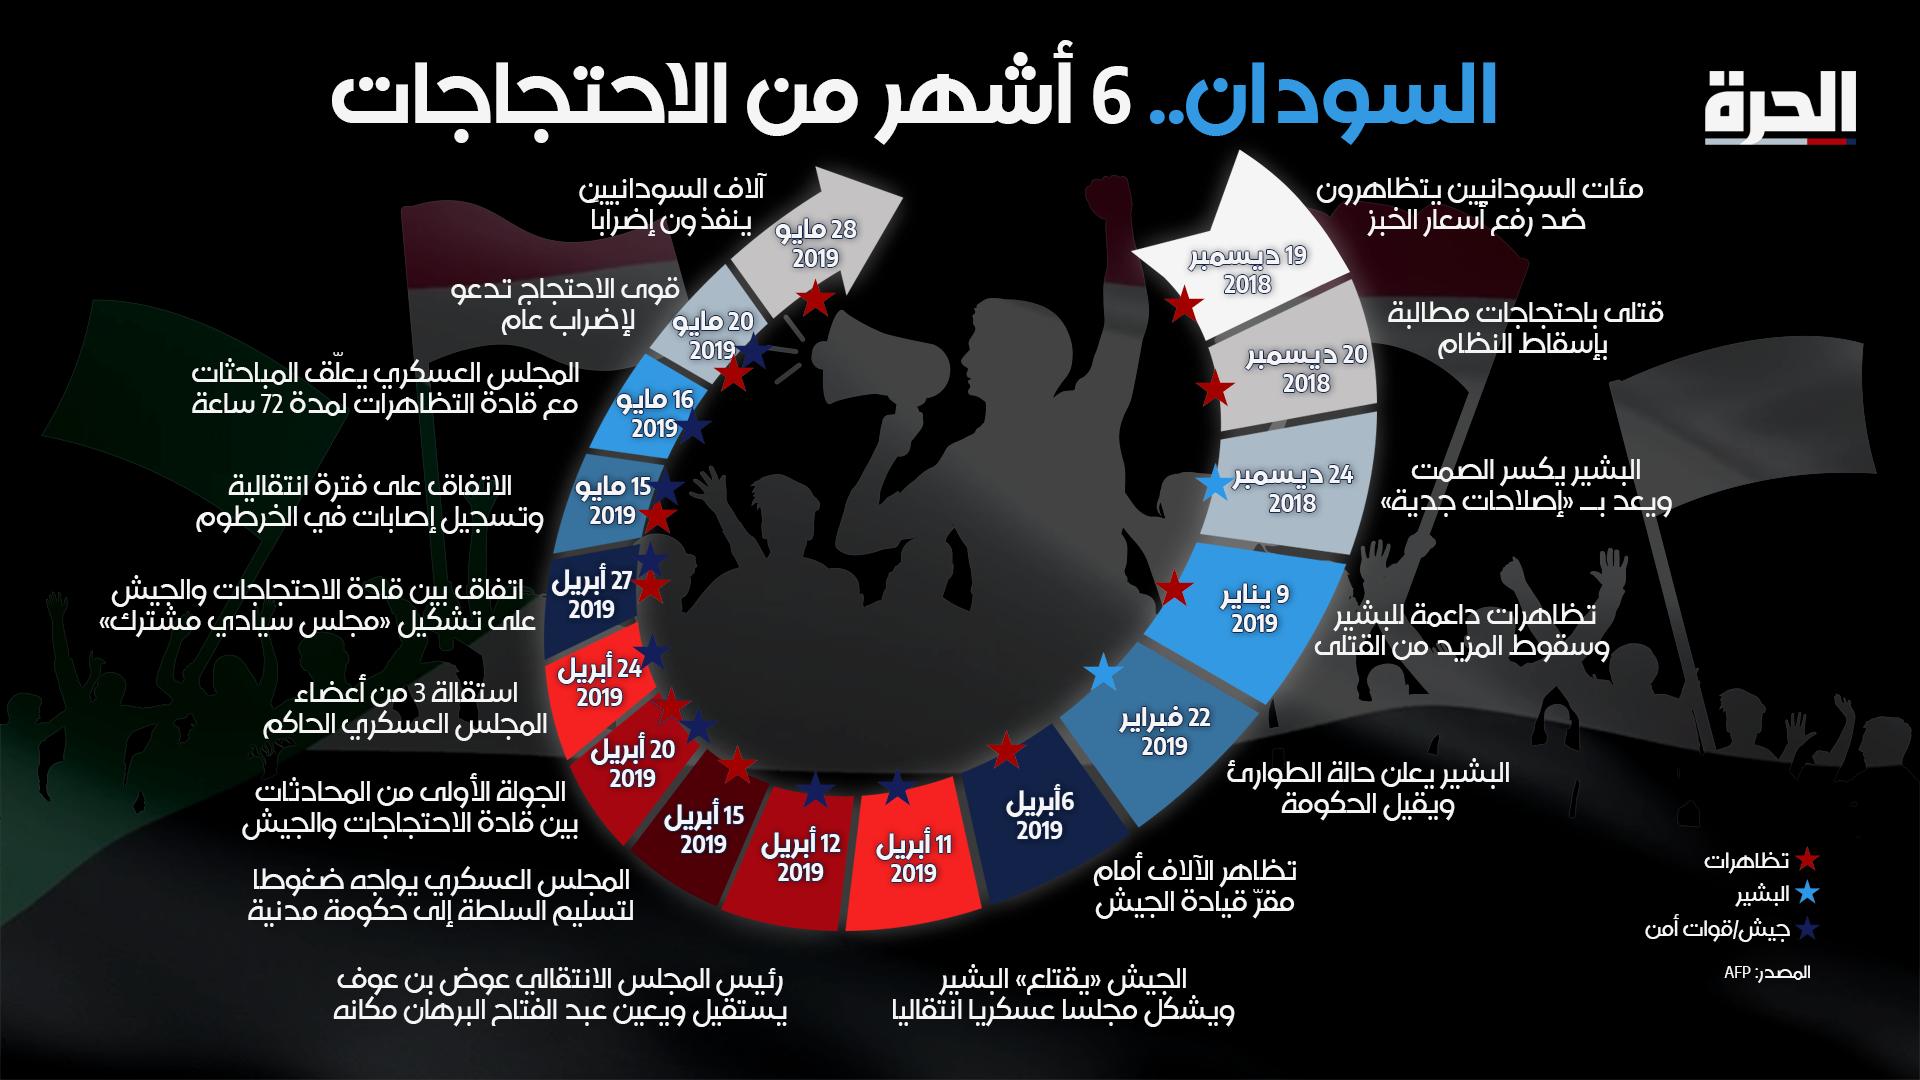 مسار احتجاجات السودان منذ انطلاقها